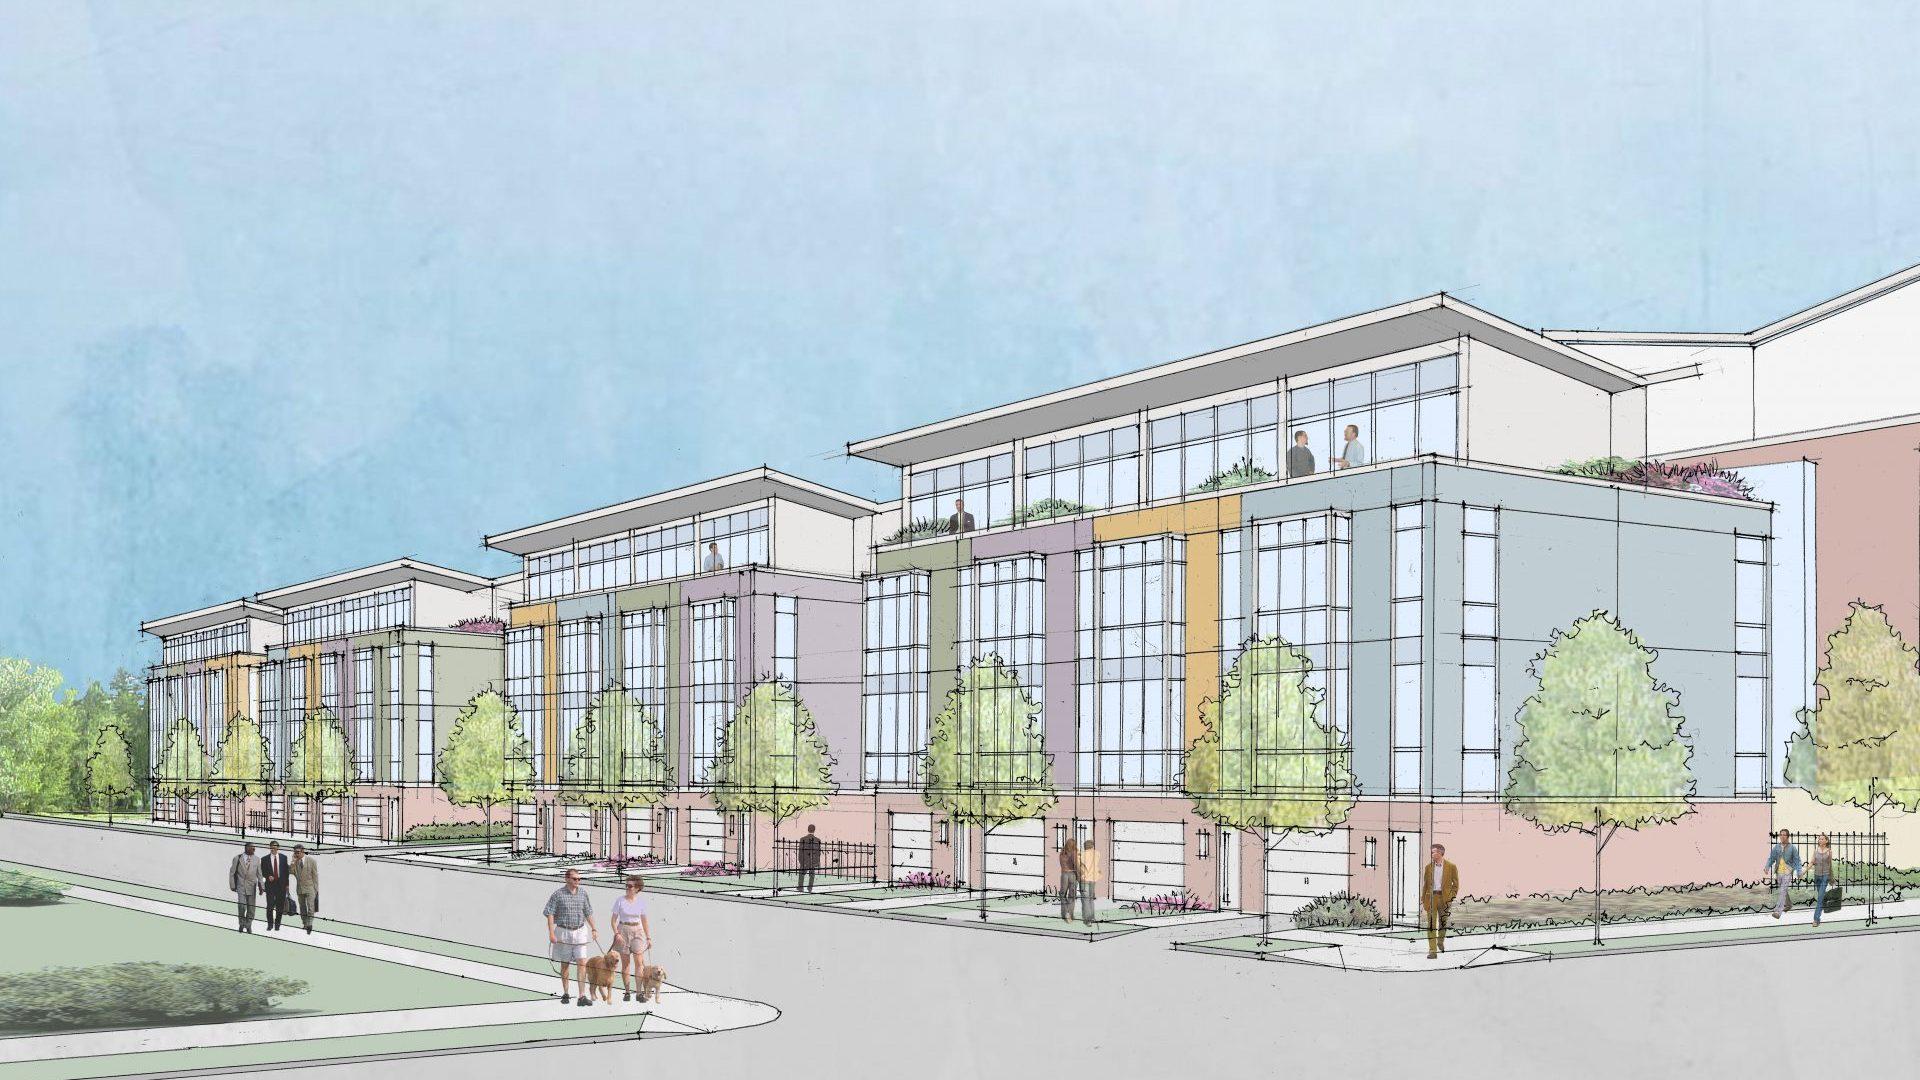 South Troy Waterfront Neighborhood Revitalization Rendering